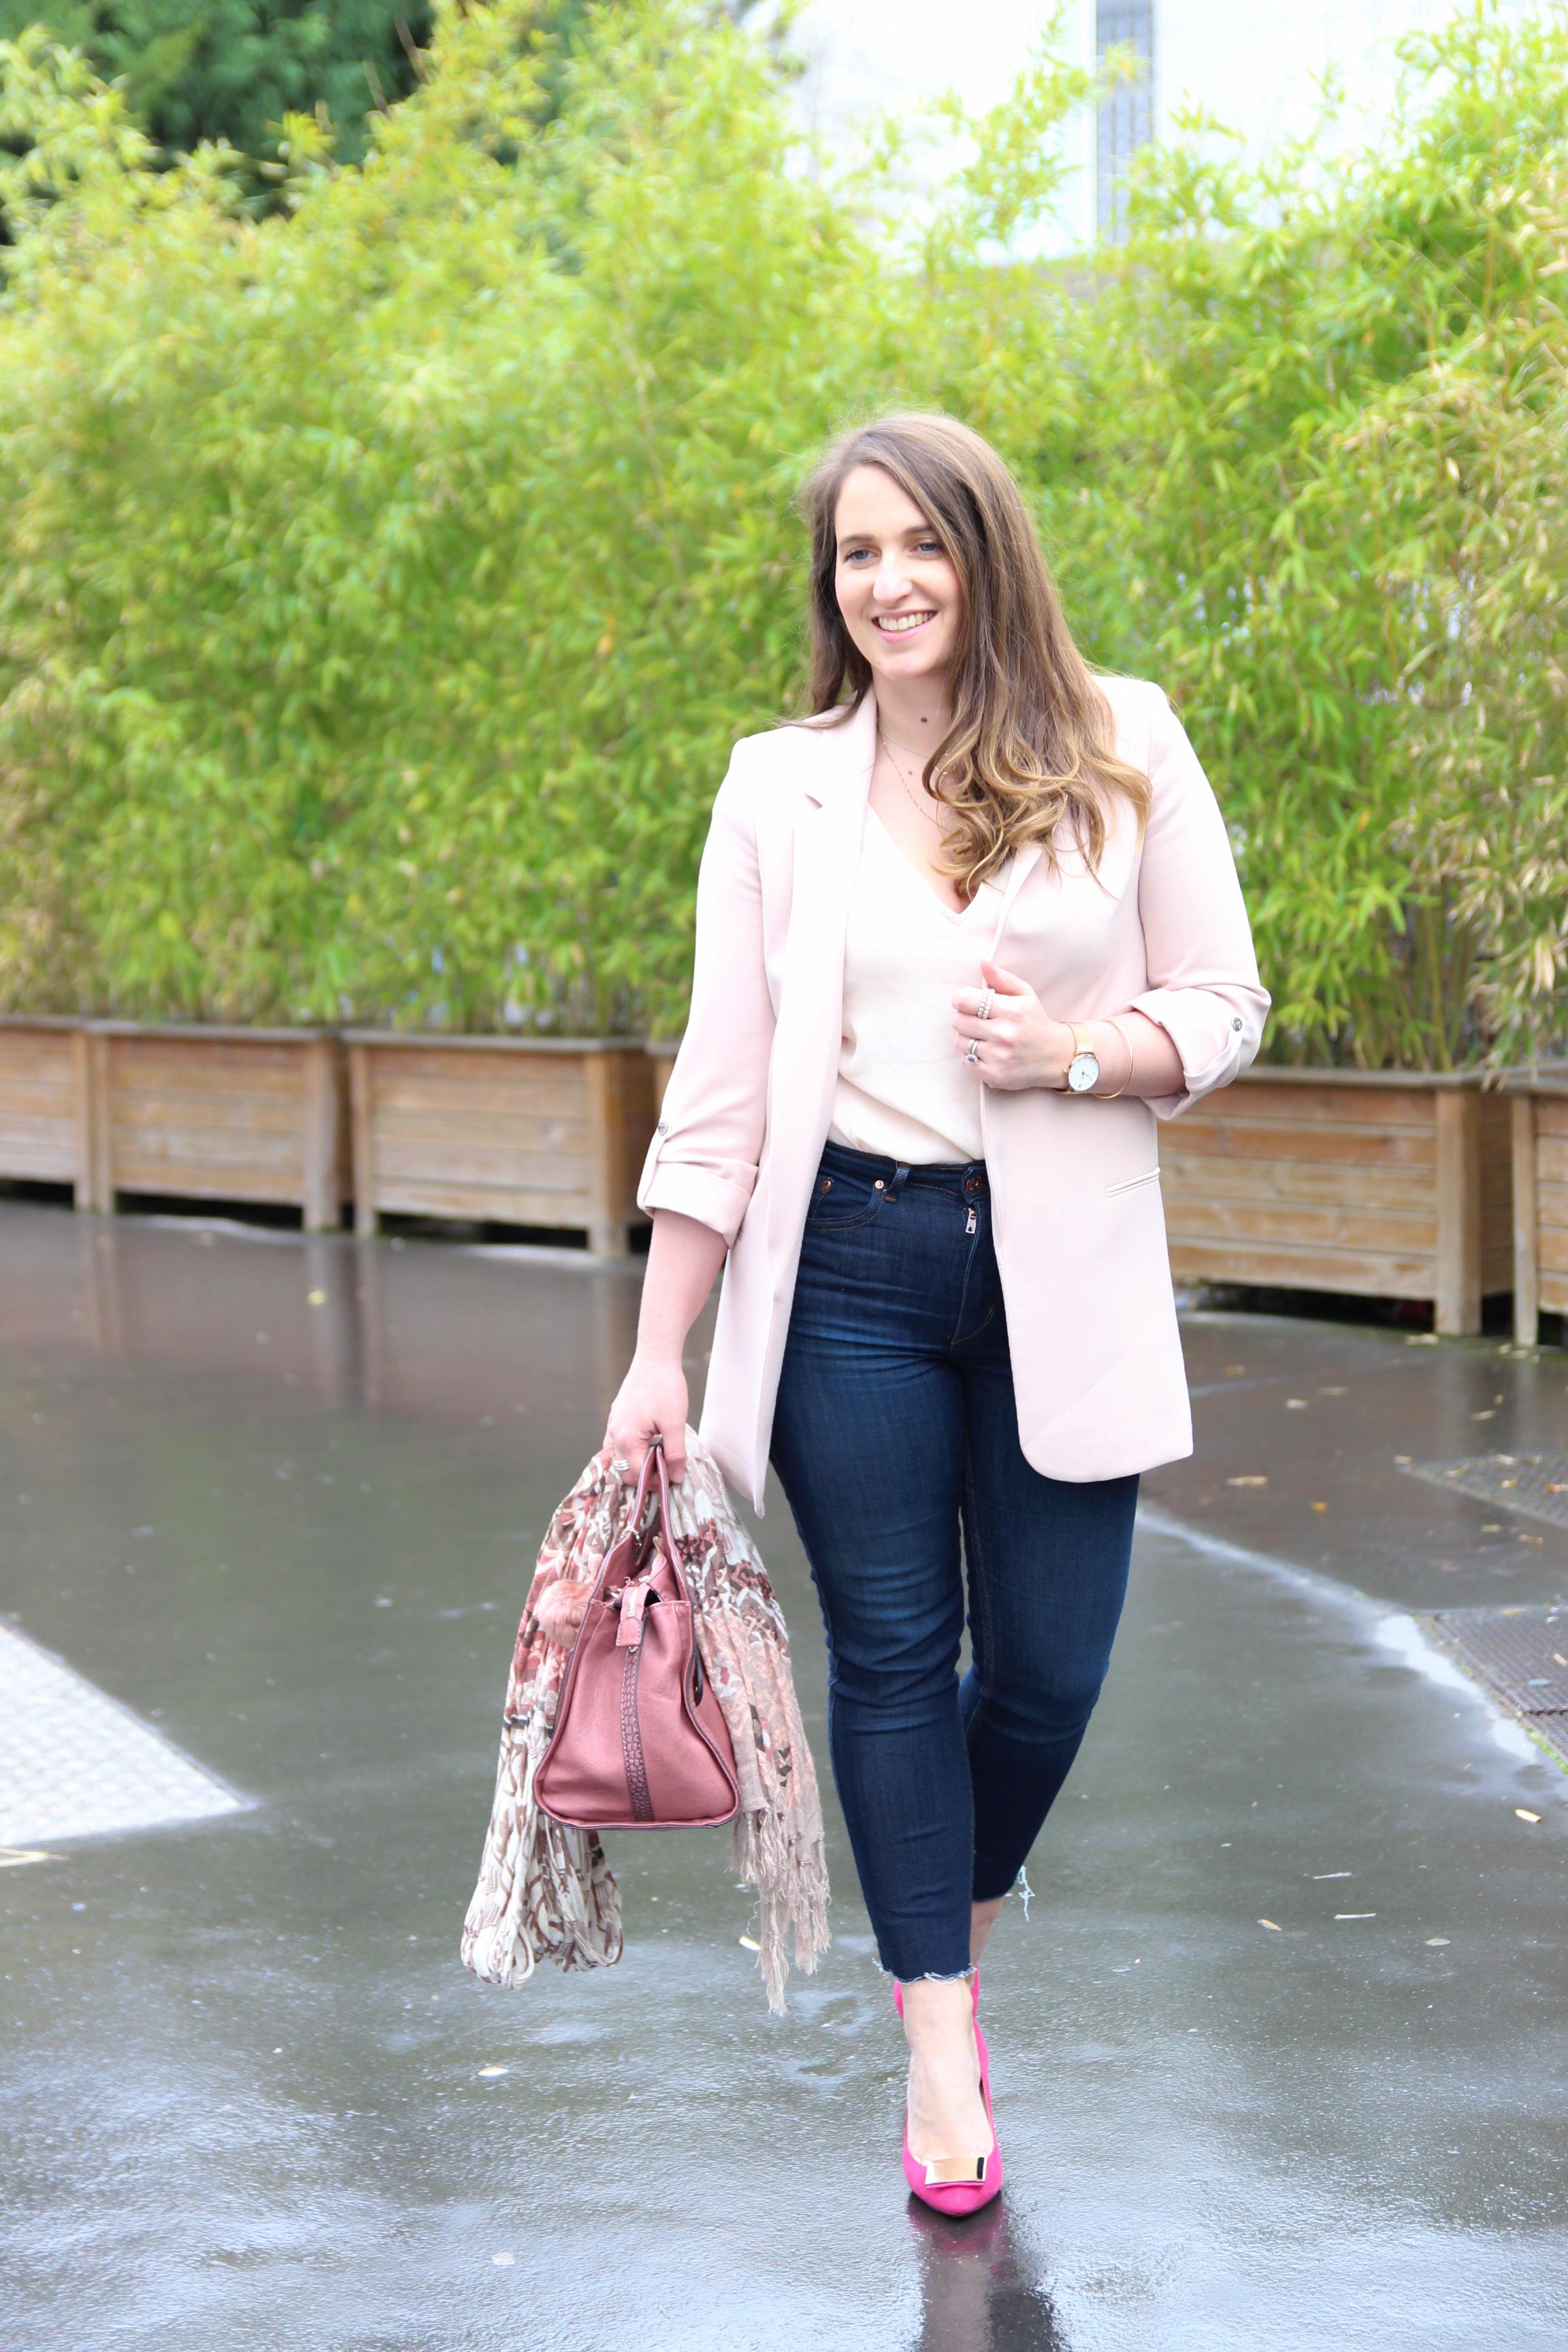 fashionblogger-influencer-jacket-zara-rosepastel-paris-seralynepointcom-2017-03-21 115507